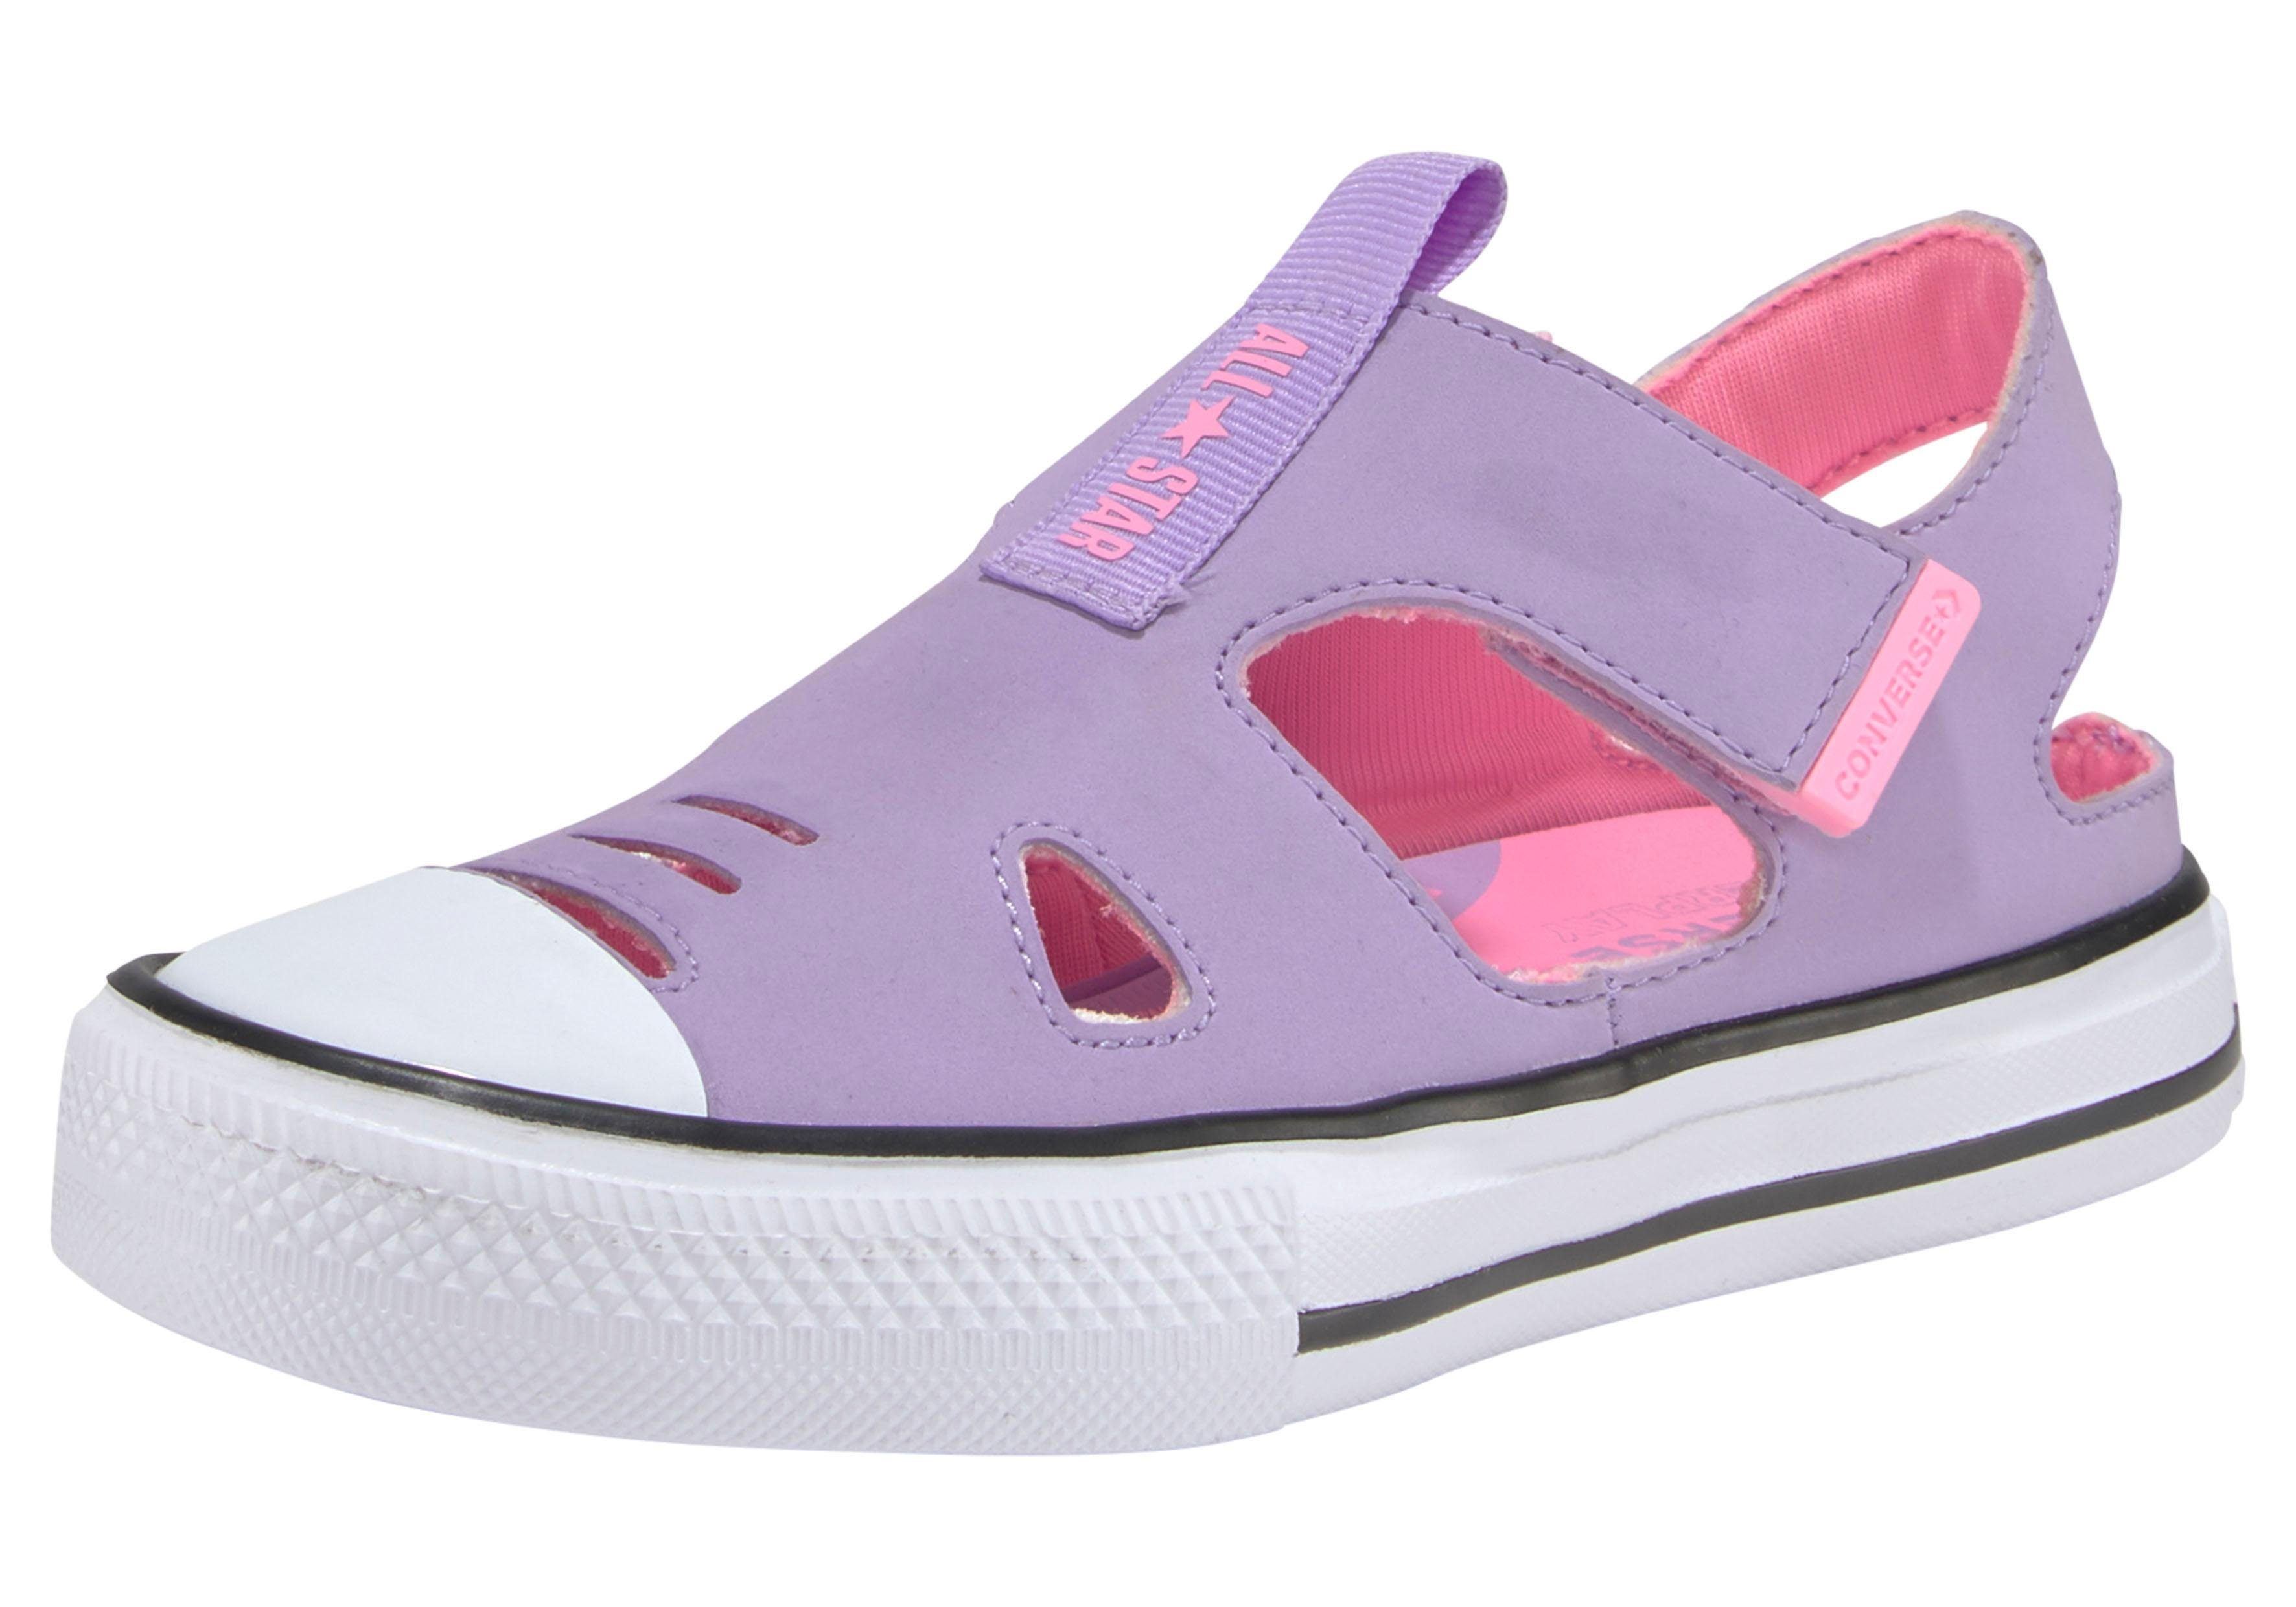 Converse »Kinder Chuck Taylor All Star Superplay Sandal« Sandale online kaufen | OTTO